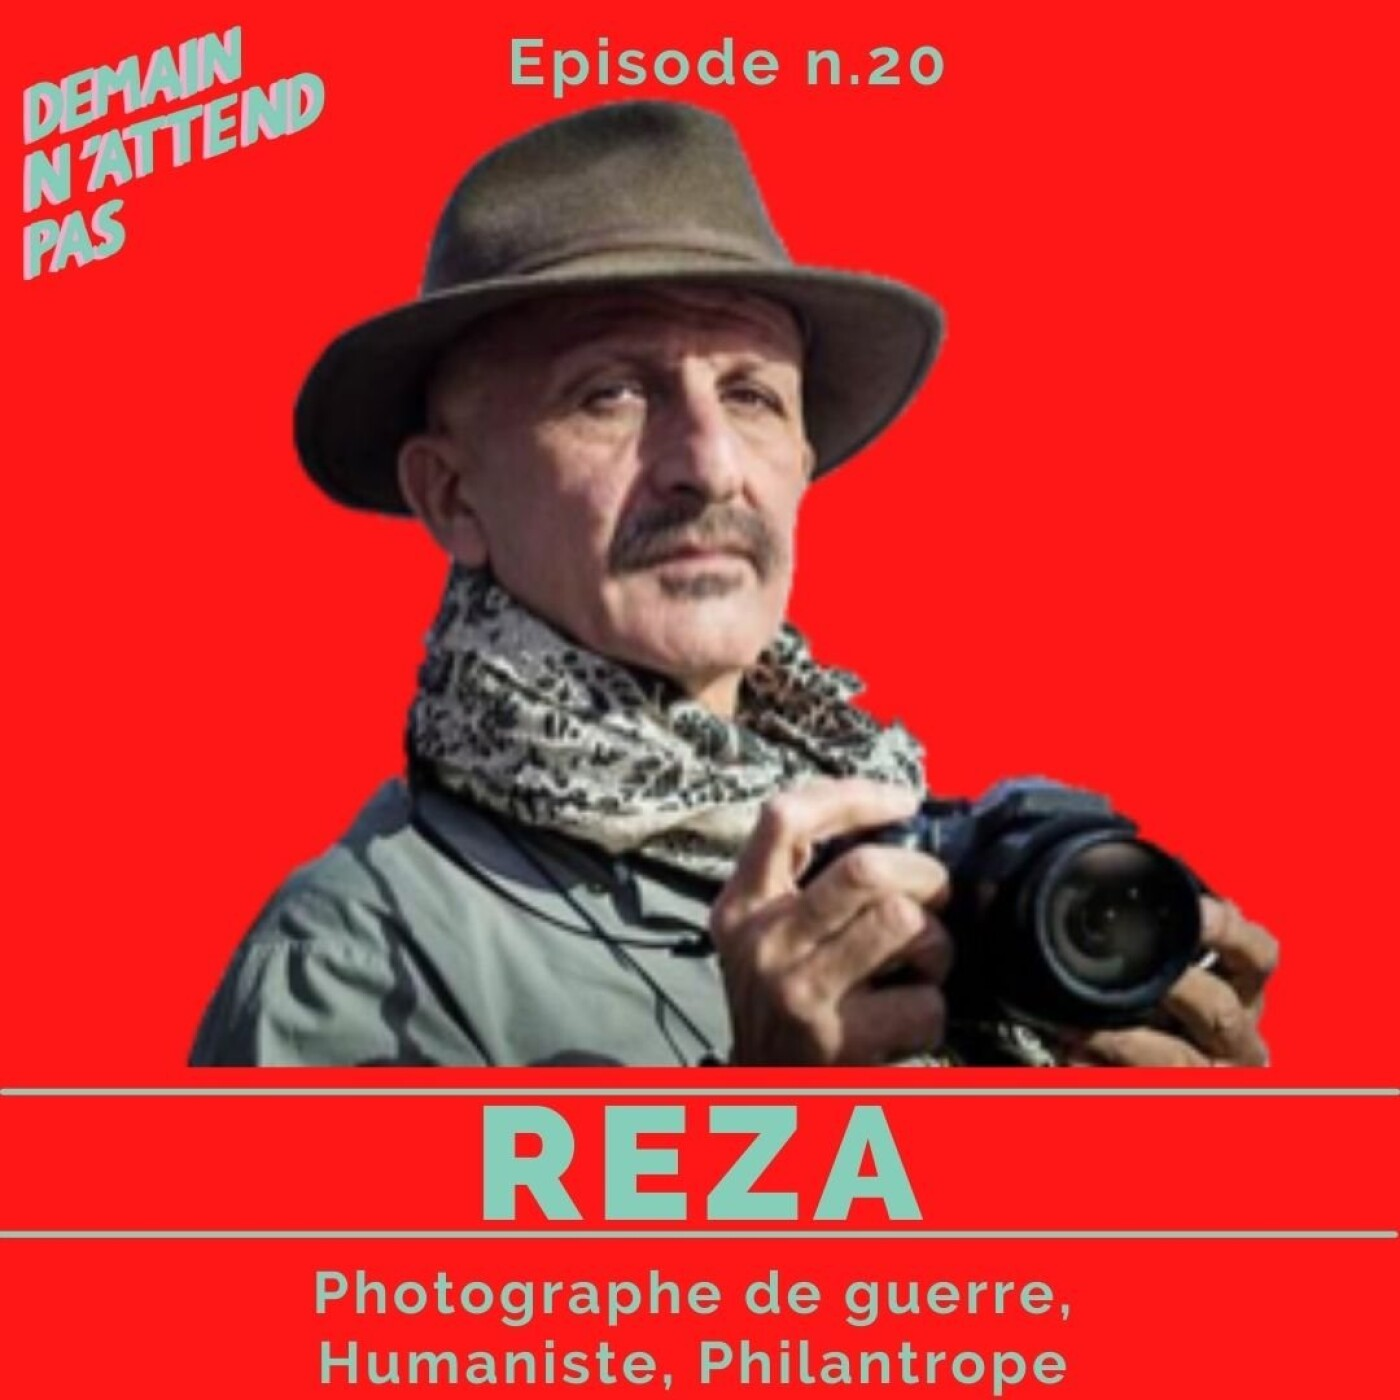 20- Reza, photographe de guerre, humaniste, philantrope